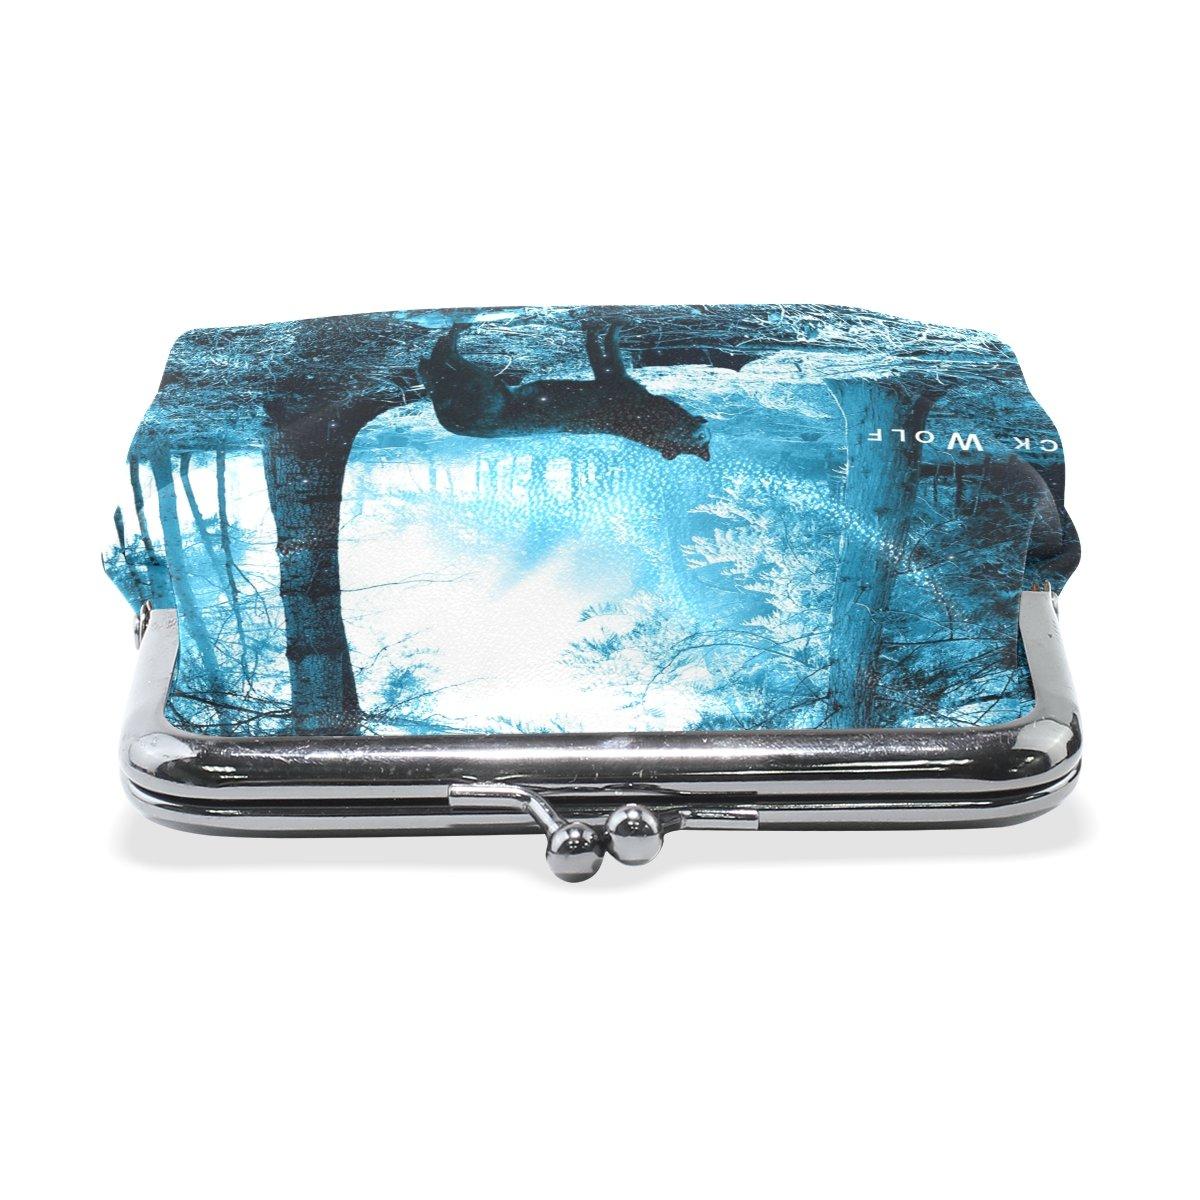 Coin Purse Wolf Forest Wallet Buckle Clutch Handbag For Women Girls Gift